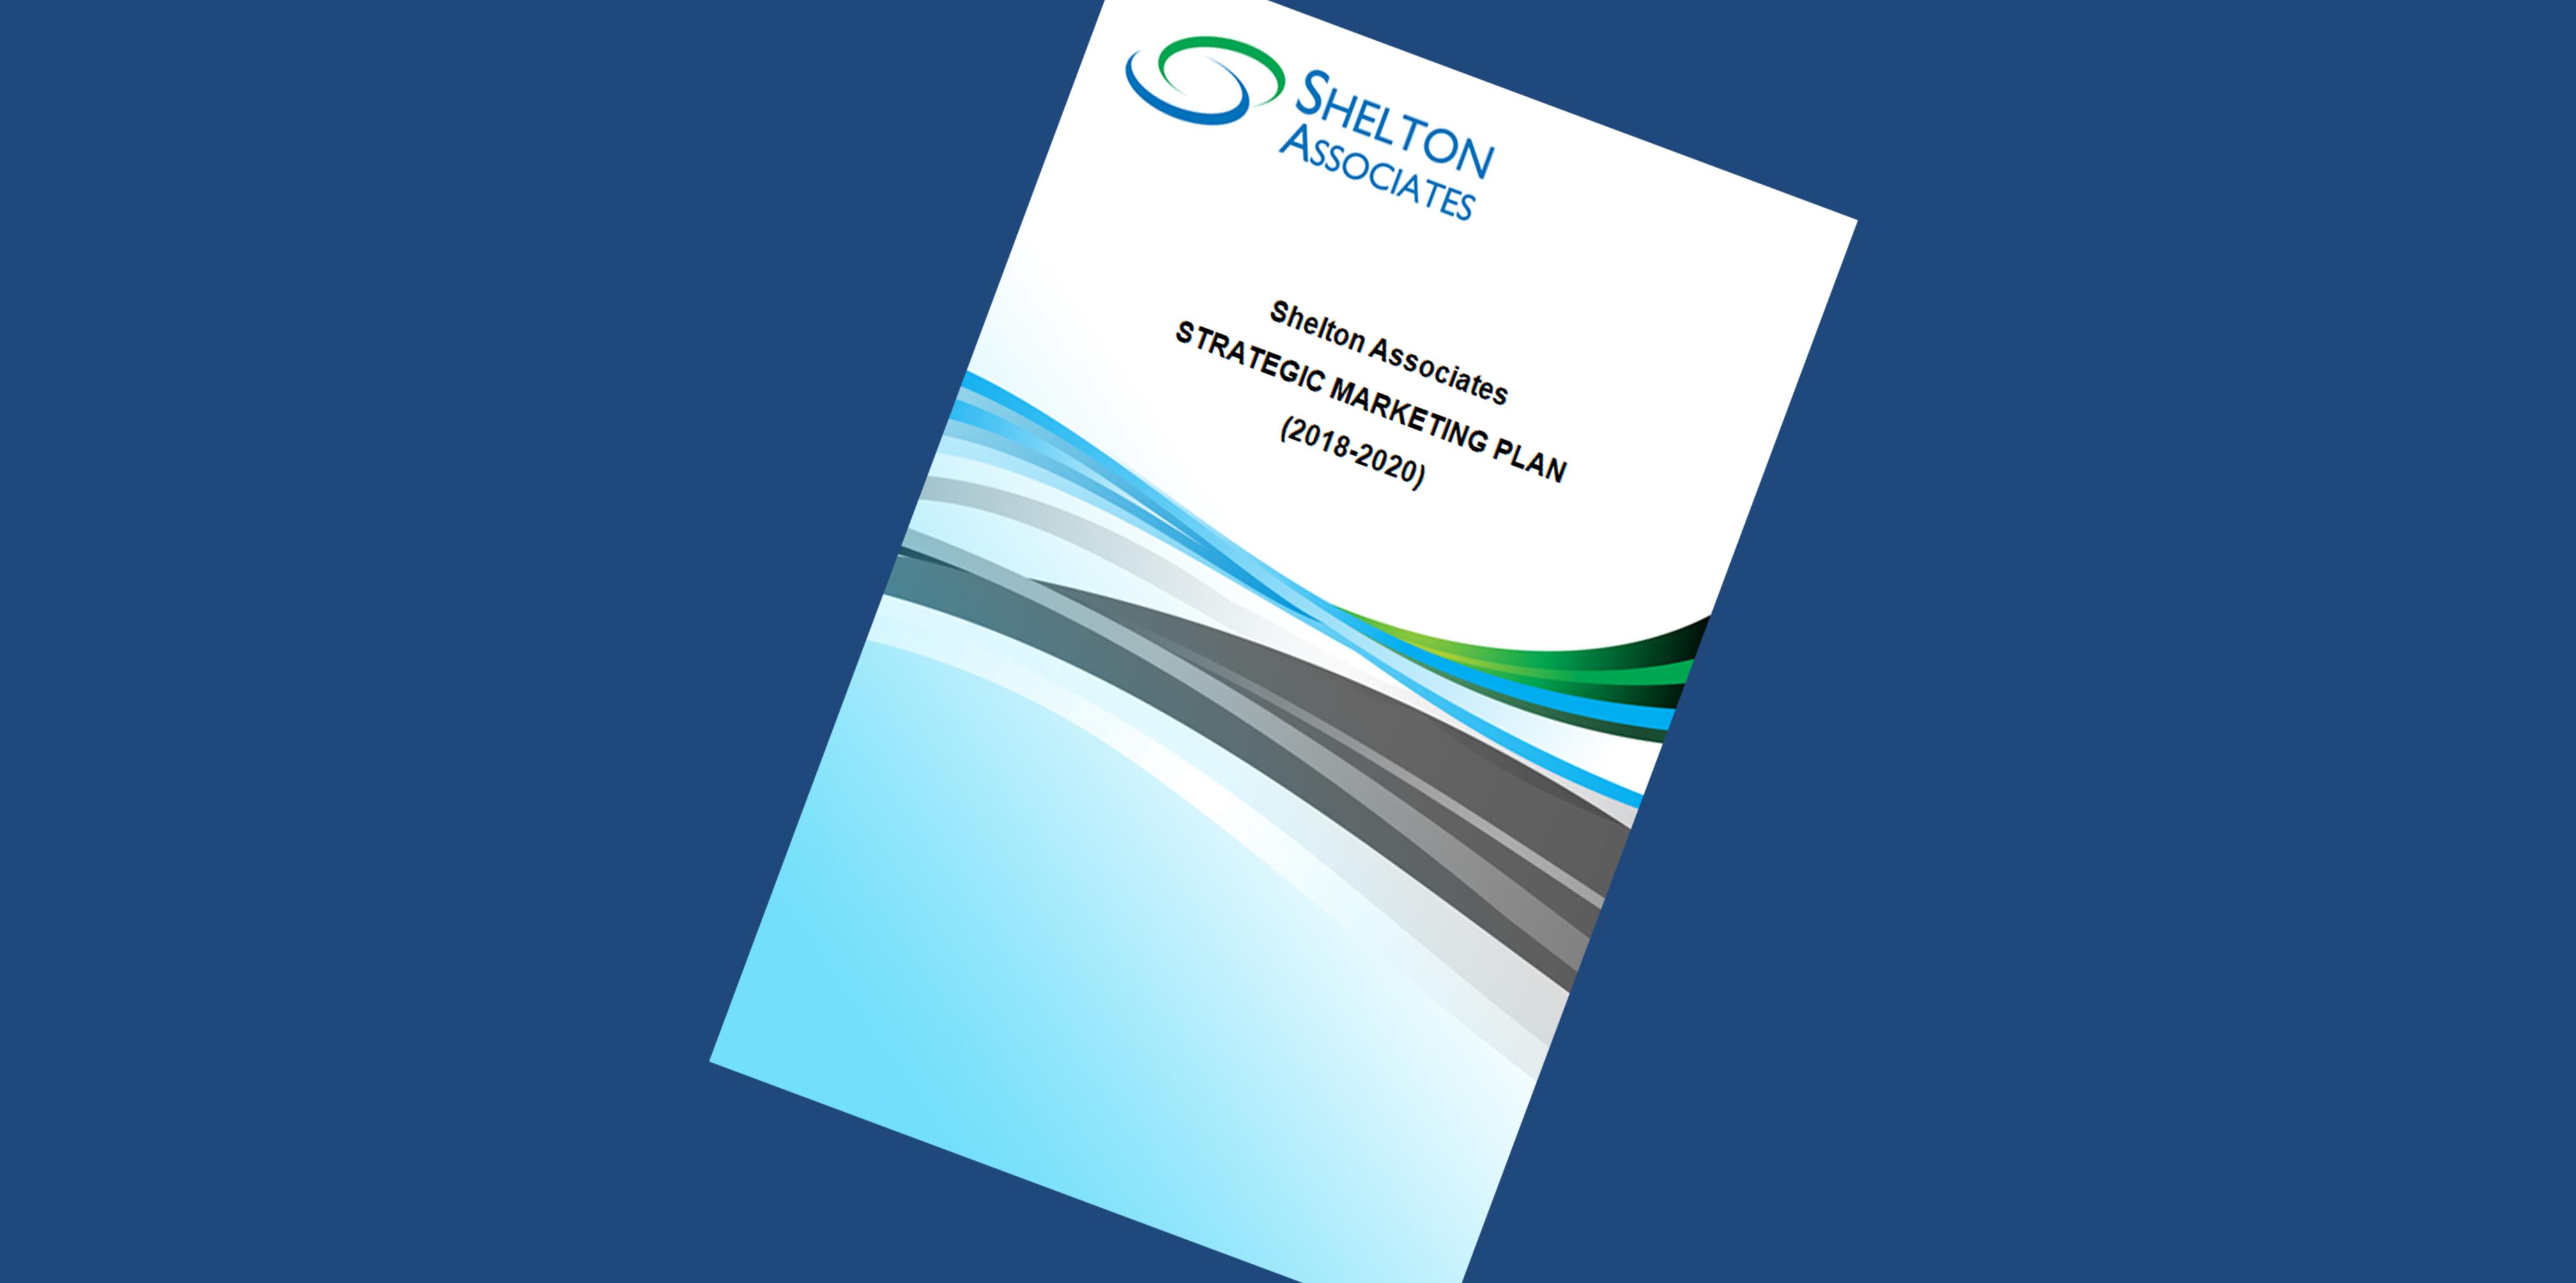 Marketing-Plan-document-from-Shelton-Associates-Sheffield